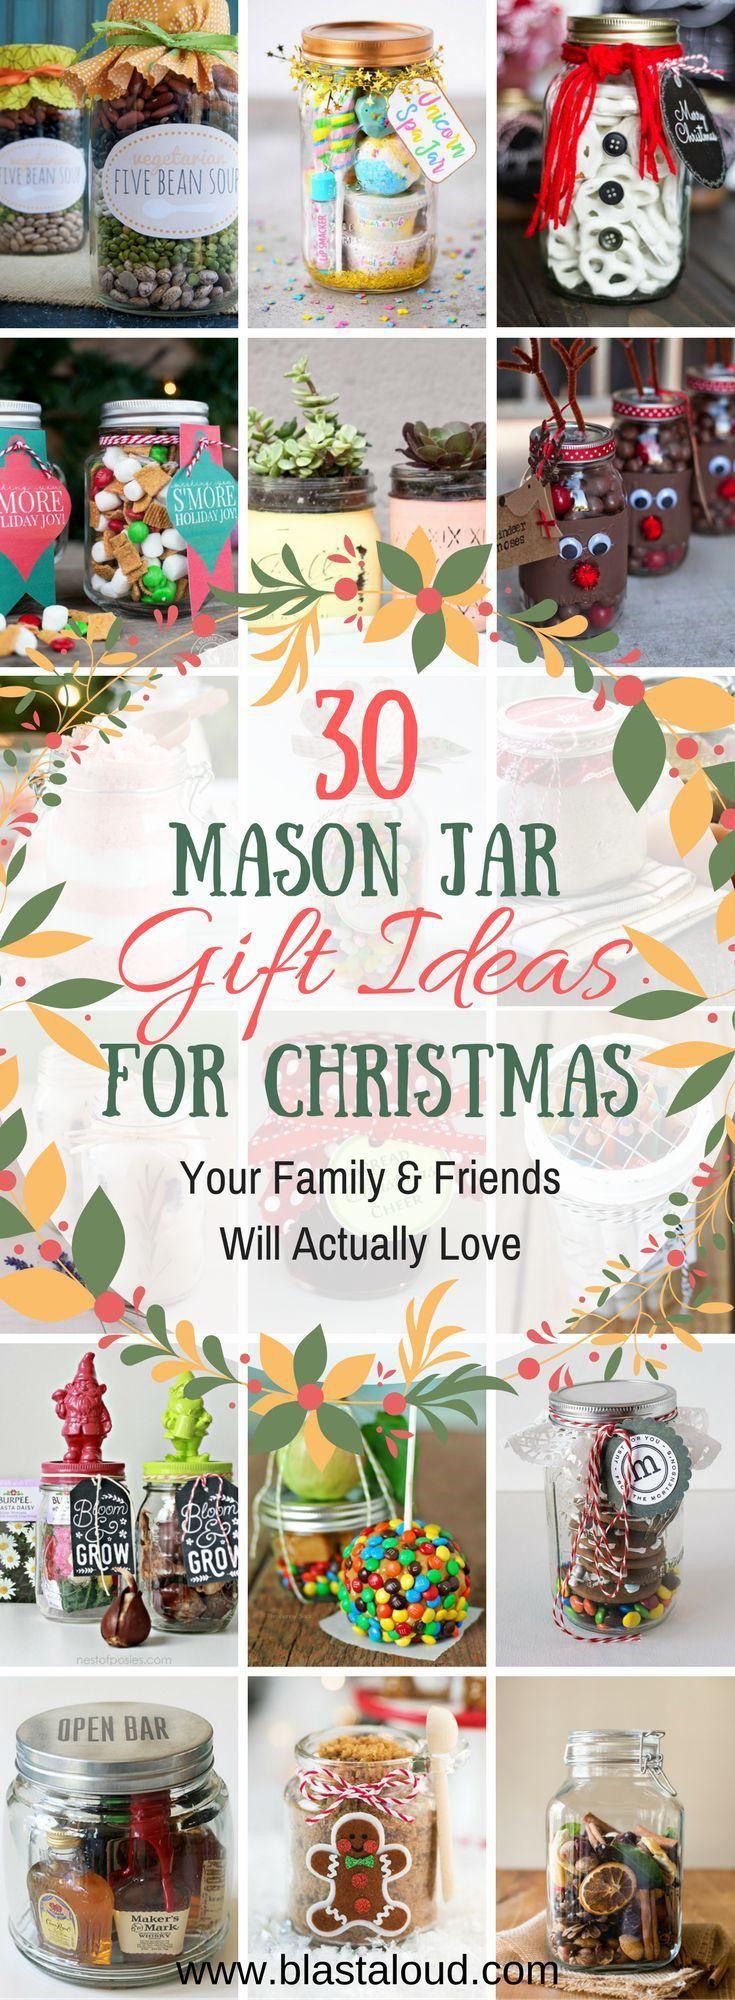 325 best DIY Holidays images on Pinterest | Christmas recipes ...